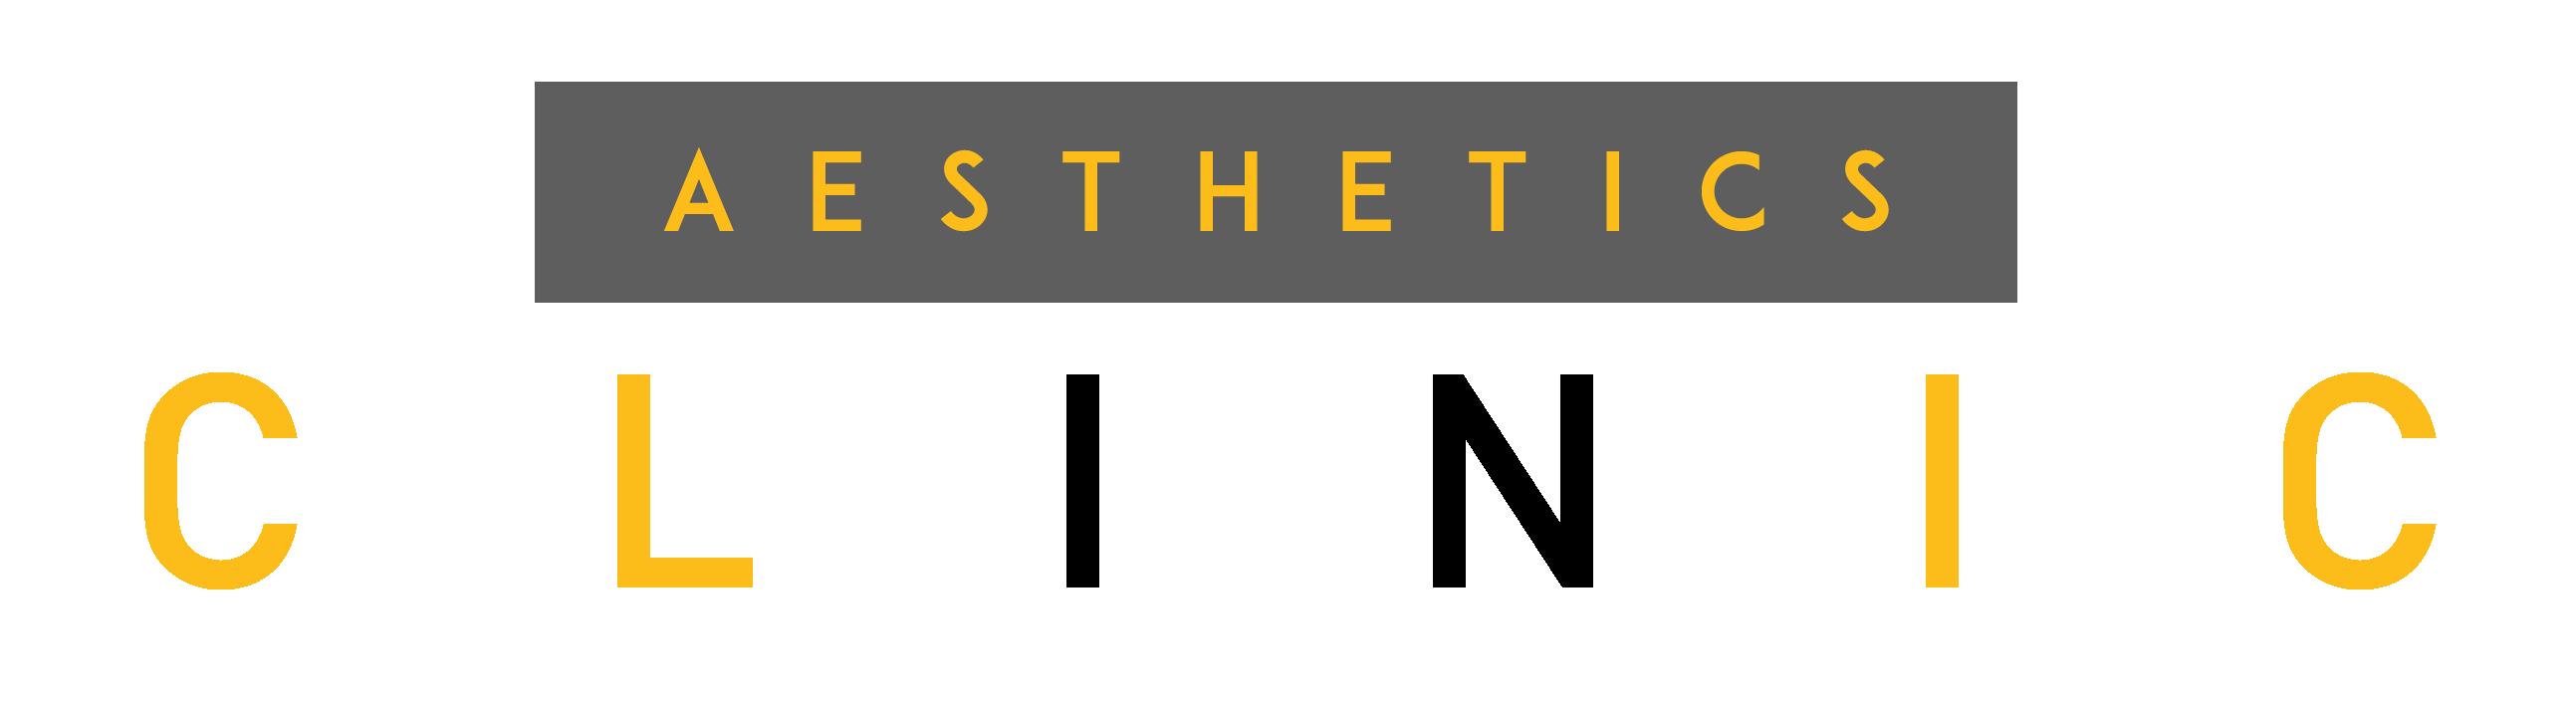 Facial Aesthetics Ripponden | XIV Aesthetics Clinic Ripponden, Sowerby Bridge